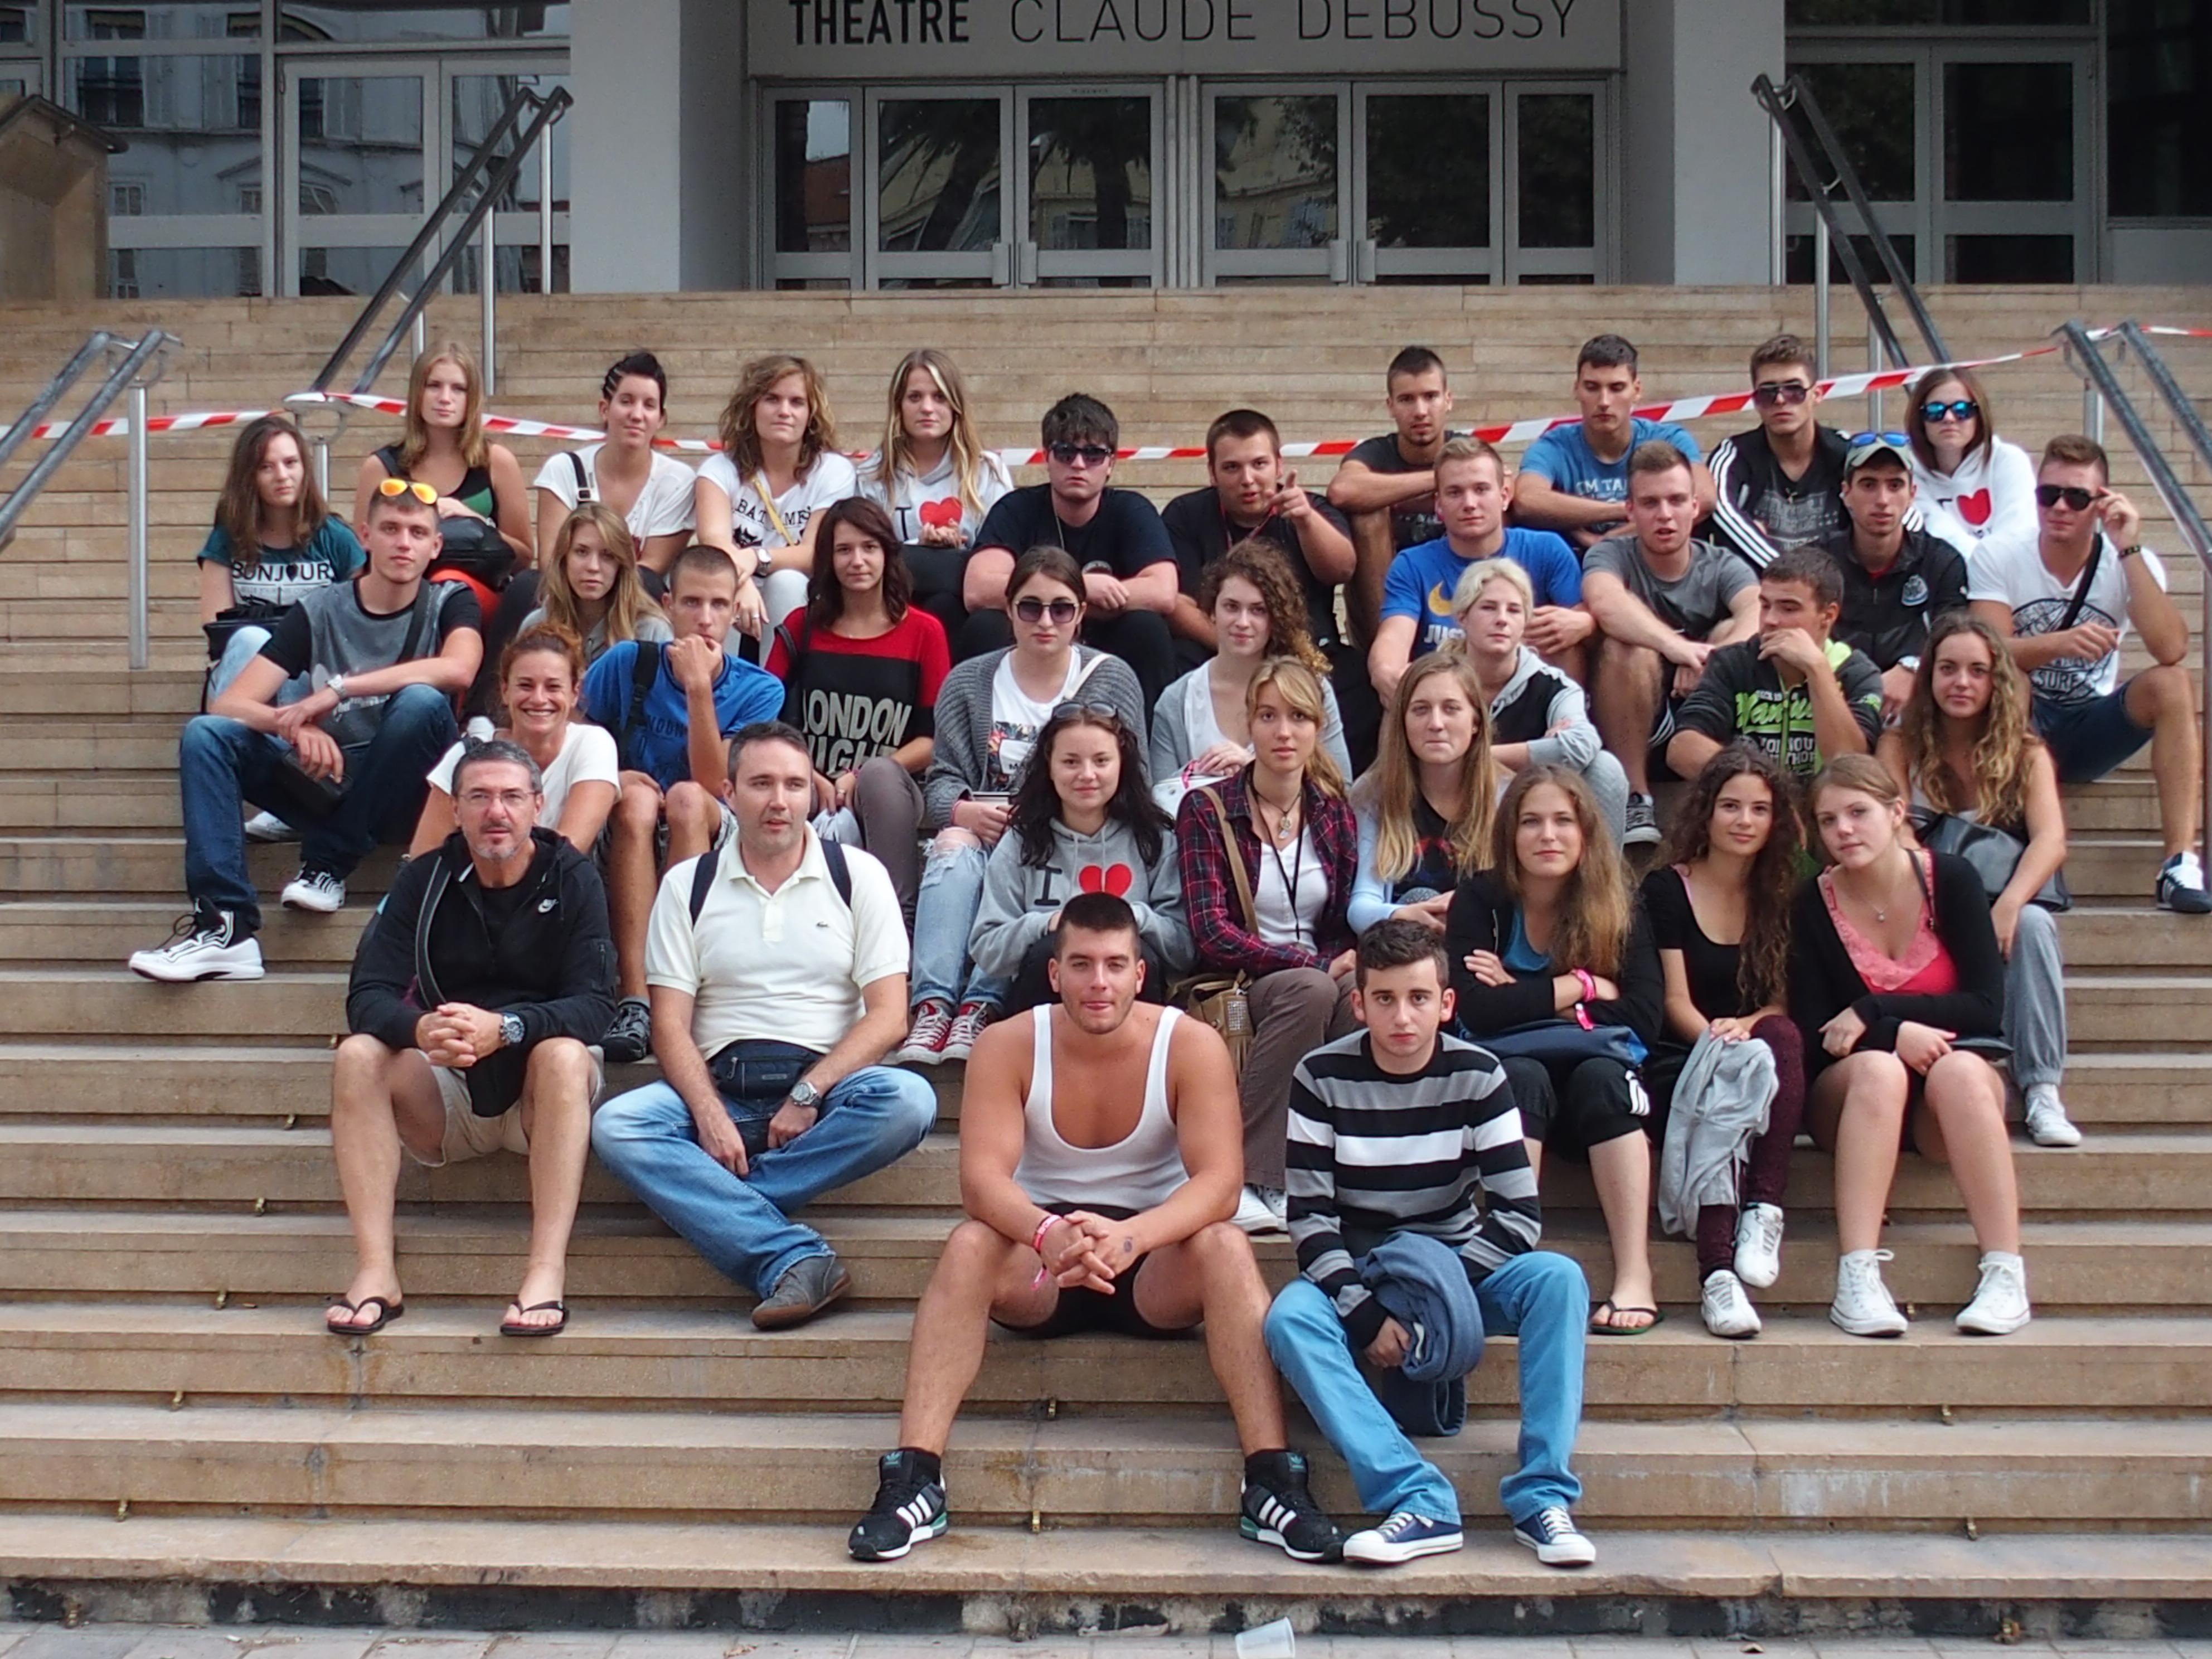 Ekskurzija-Španjolska 2014-Canes